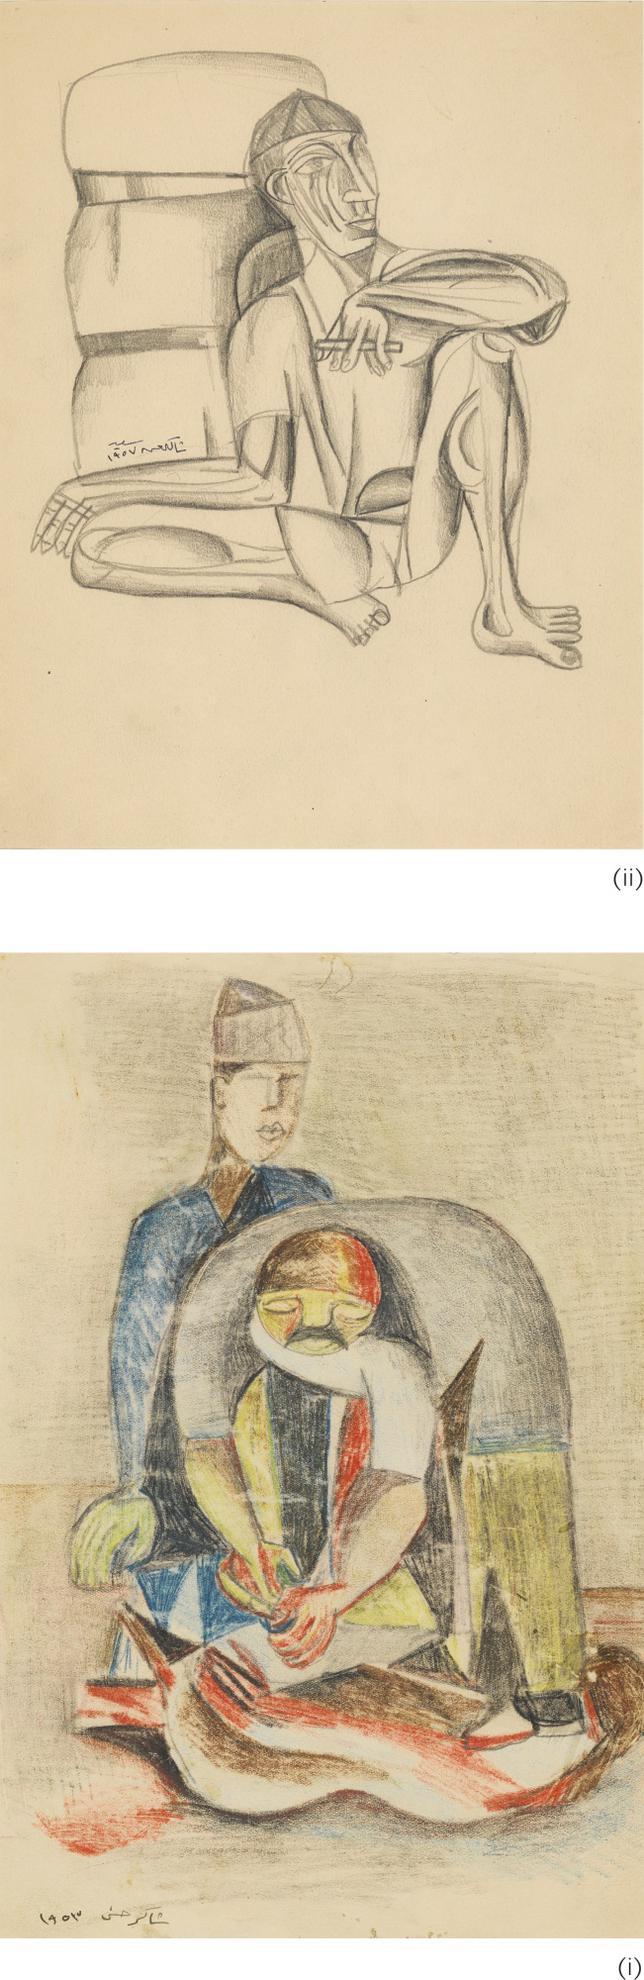 Shakir Hassan Al-Said - (I) Untitled (Two Figures) (II) Untitled (Portrait of a Man)-1953